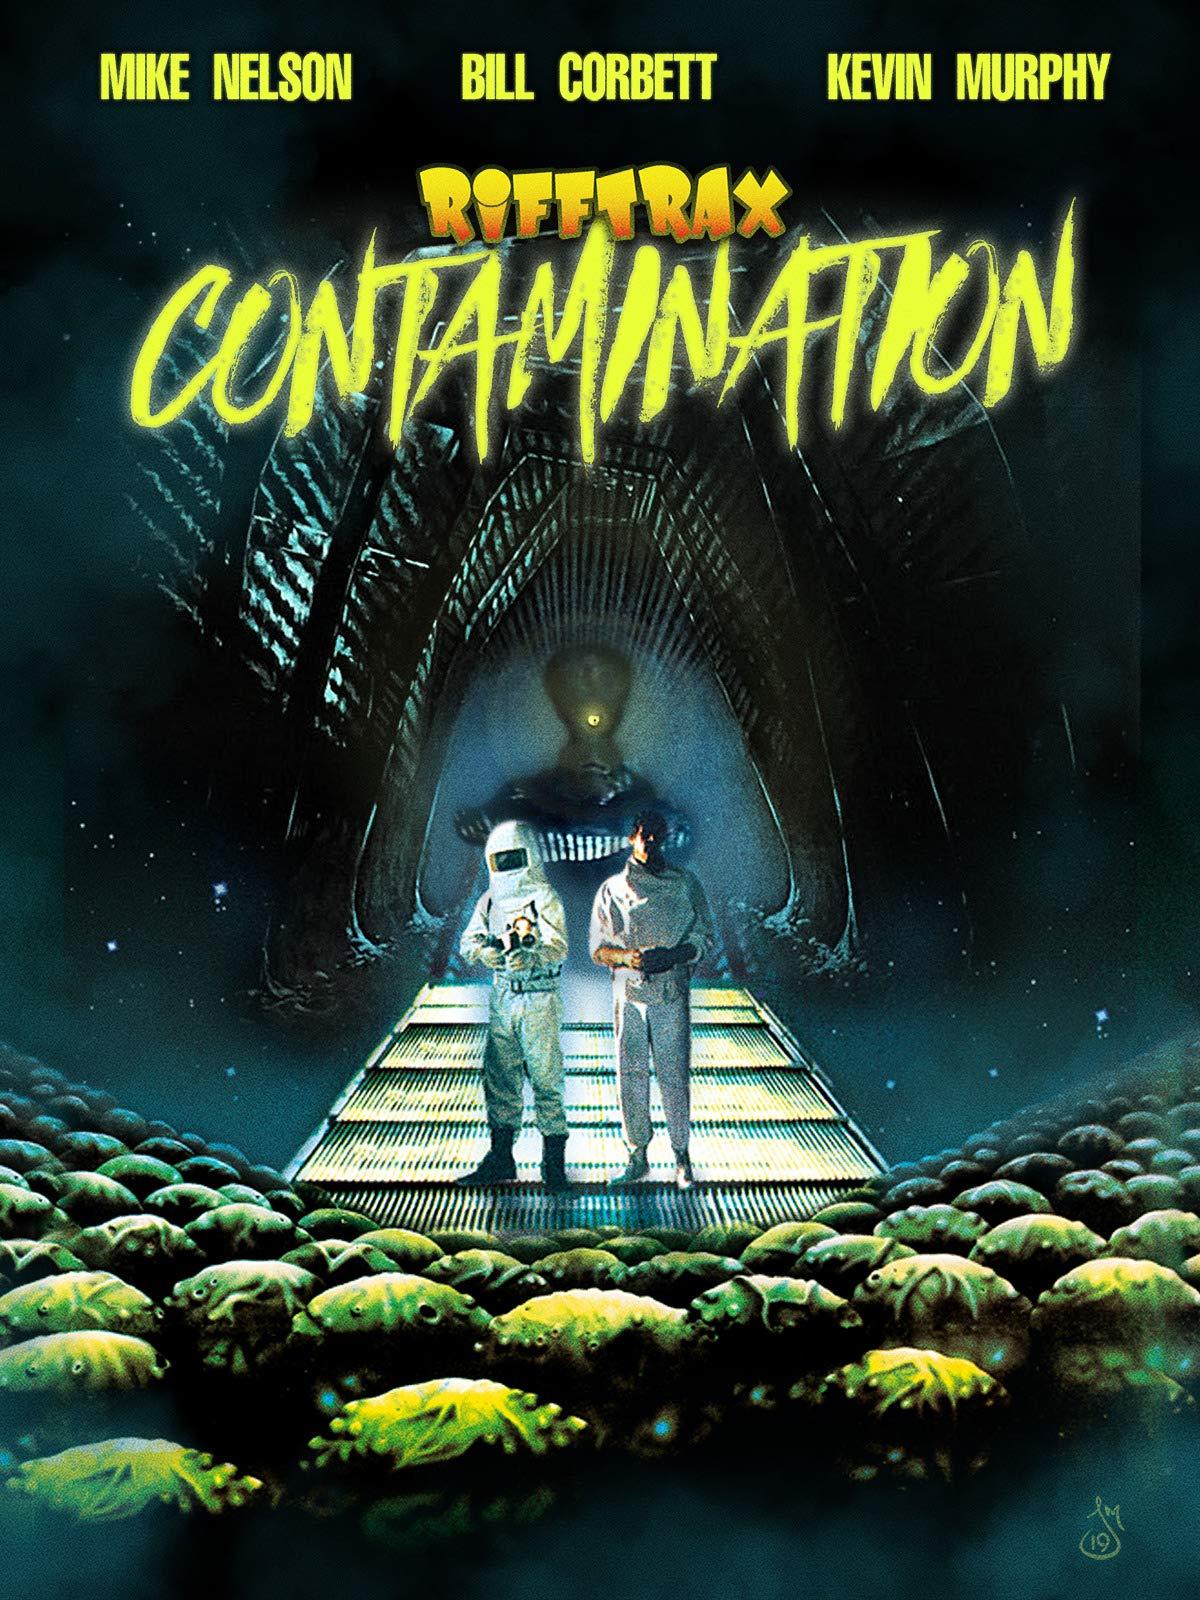 RiffTrax: Contamination